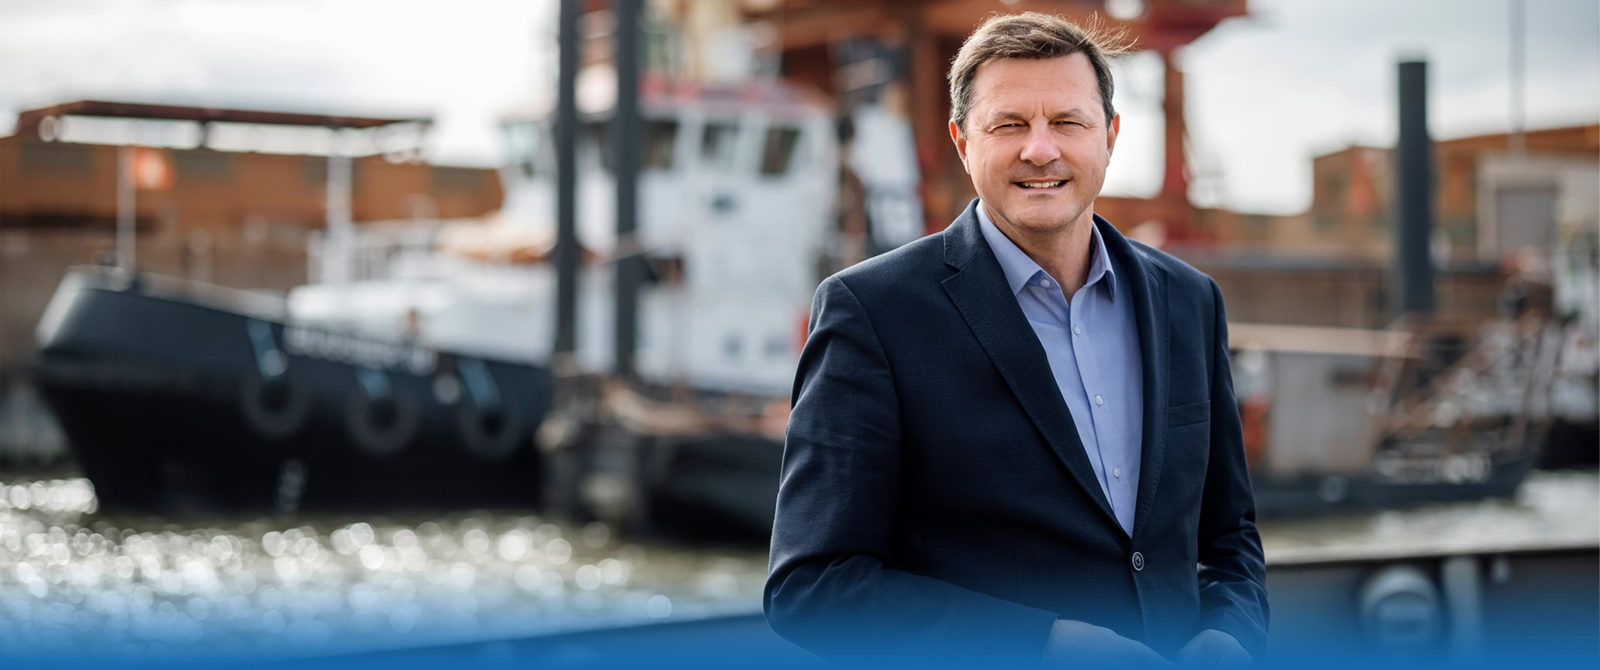 slider-oliver-grundmann-2021-bundestagswahlen-stade-rotenburg-bremervoerde (44)